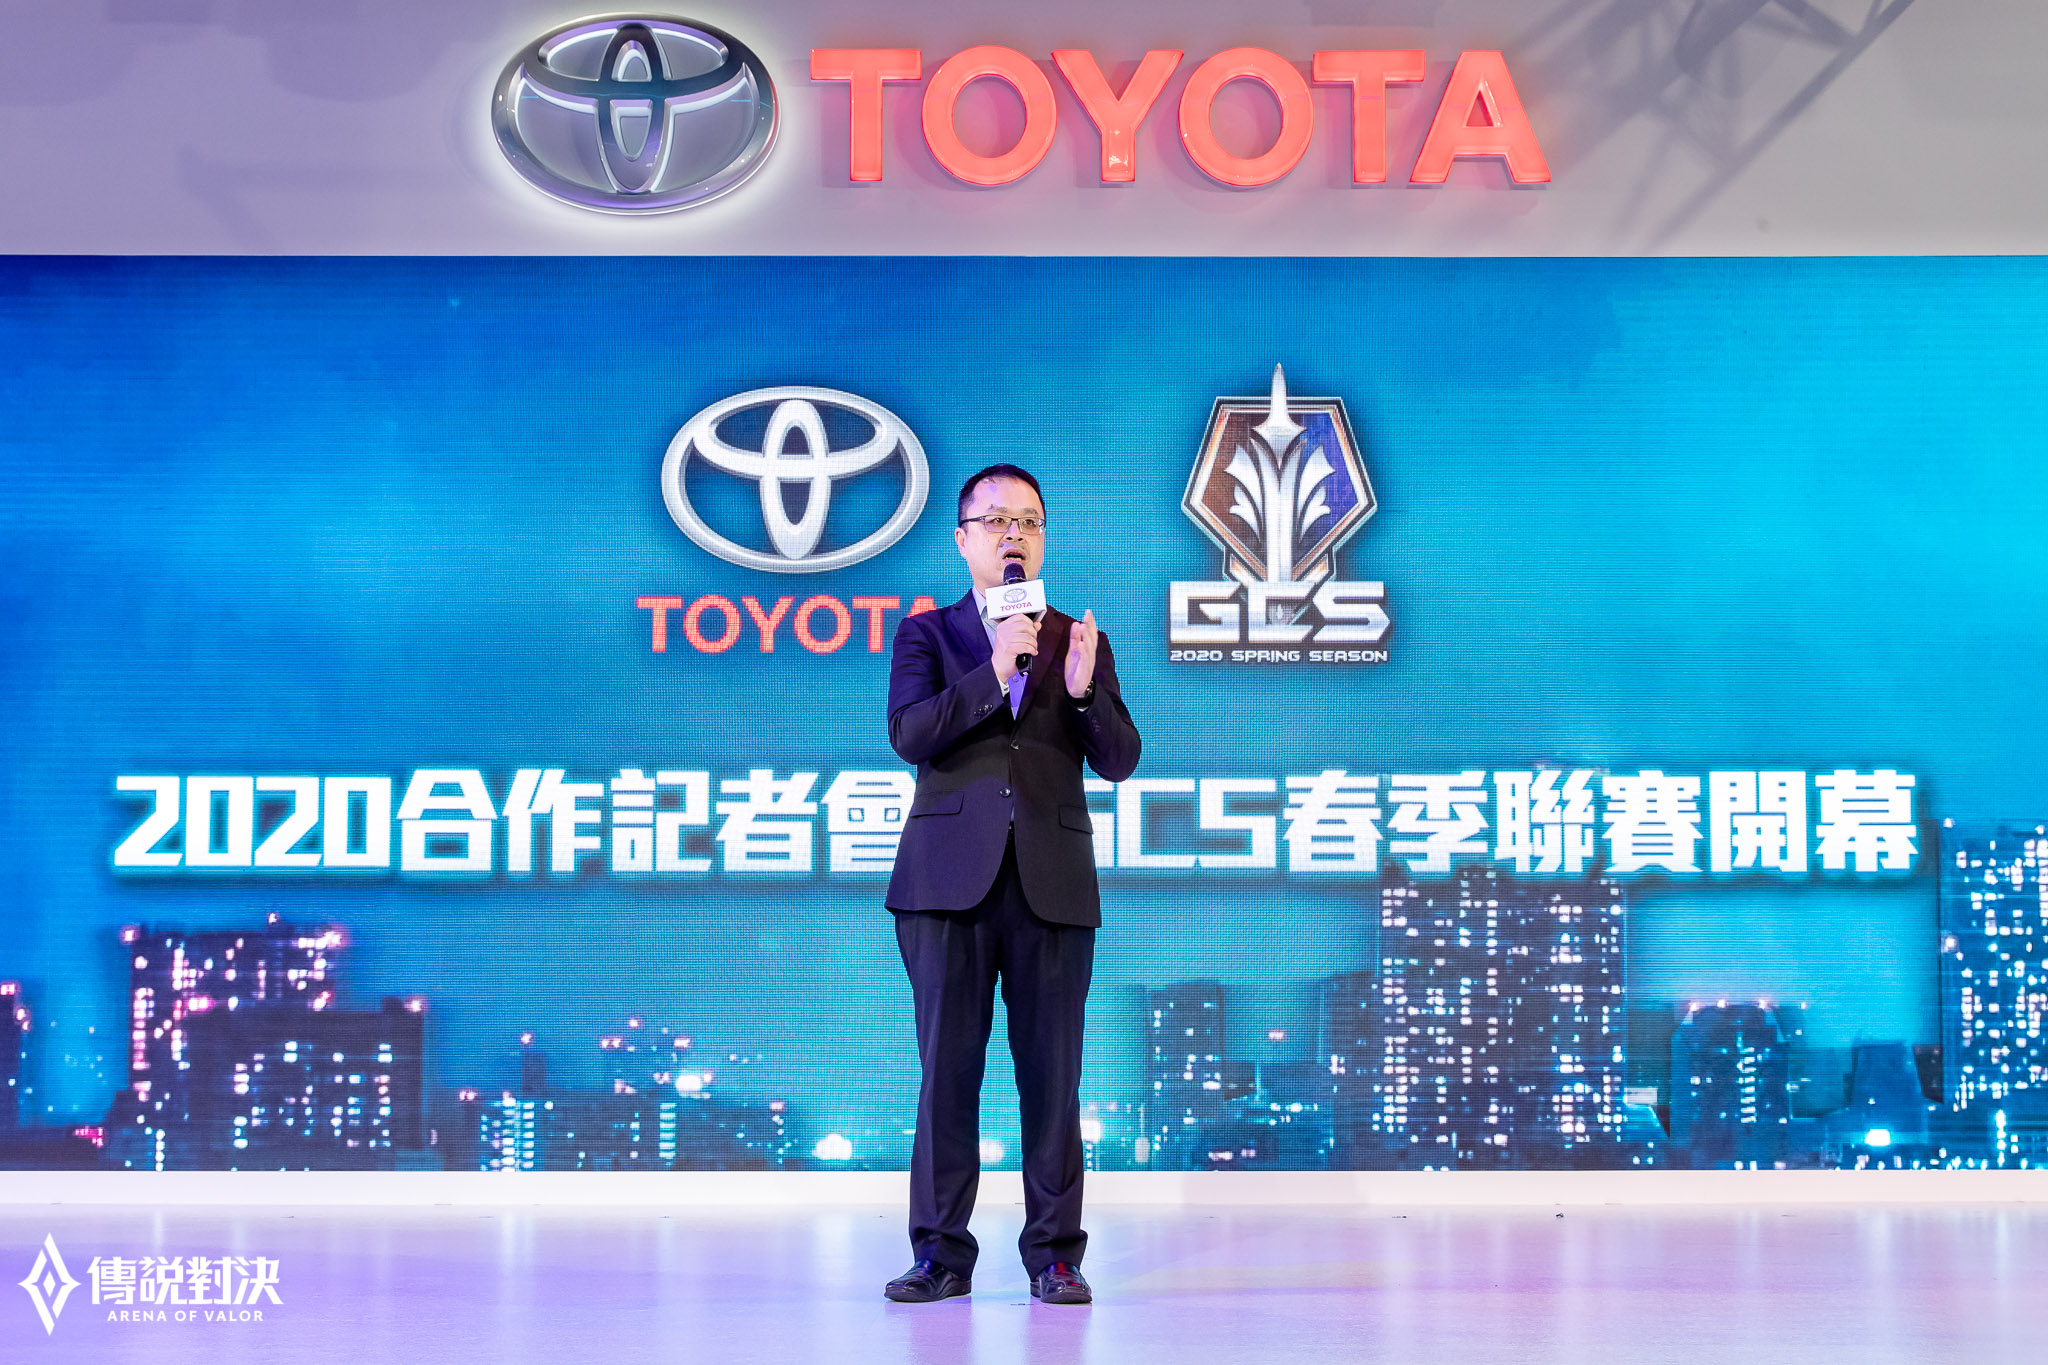 ▲TOYOTA車輛部韓志剛部長表示將持續深化與《Garena傳說對決》合作,帶給喜愛電競的年輕人更多圓夢的機會與舞台。